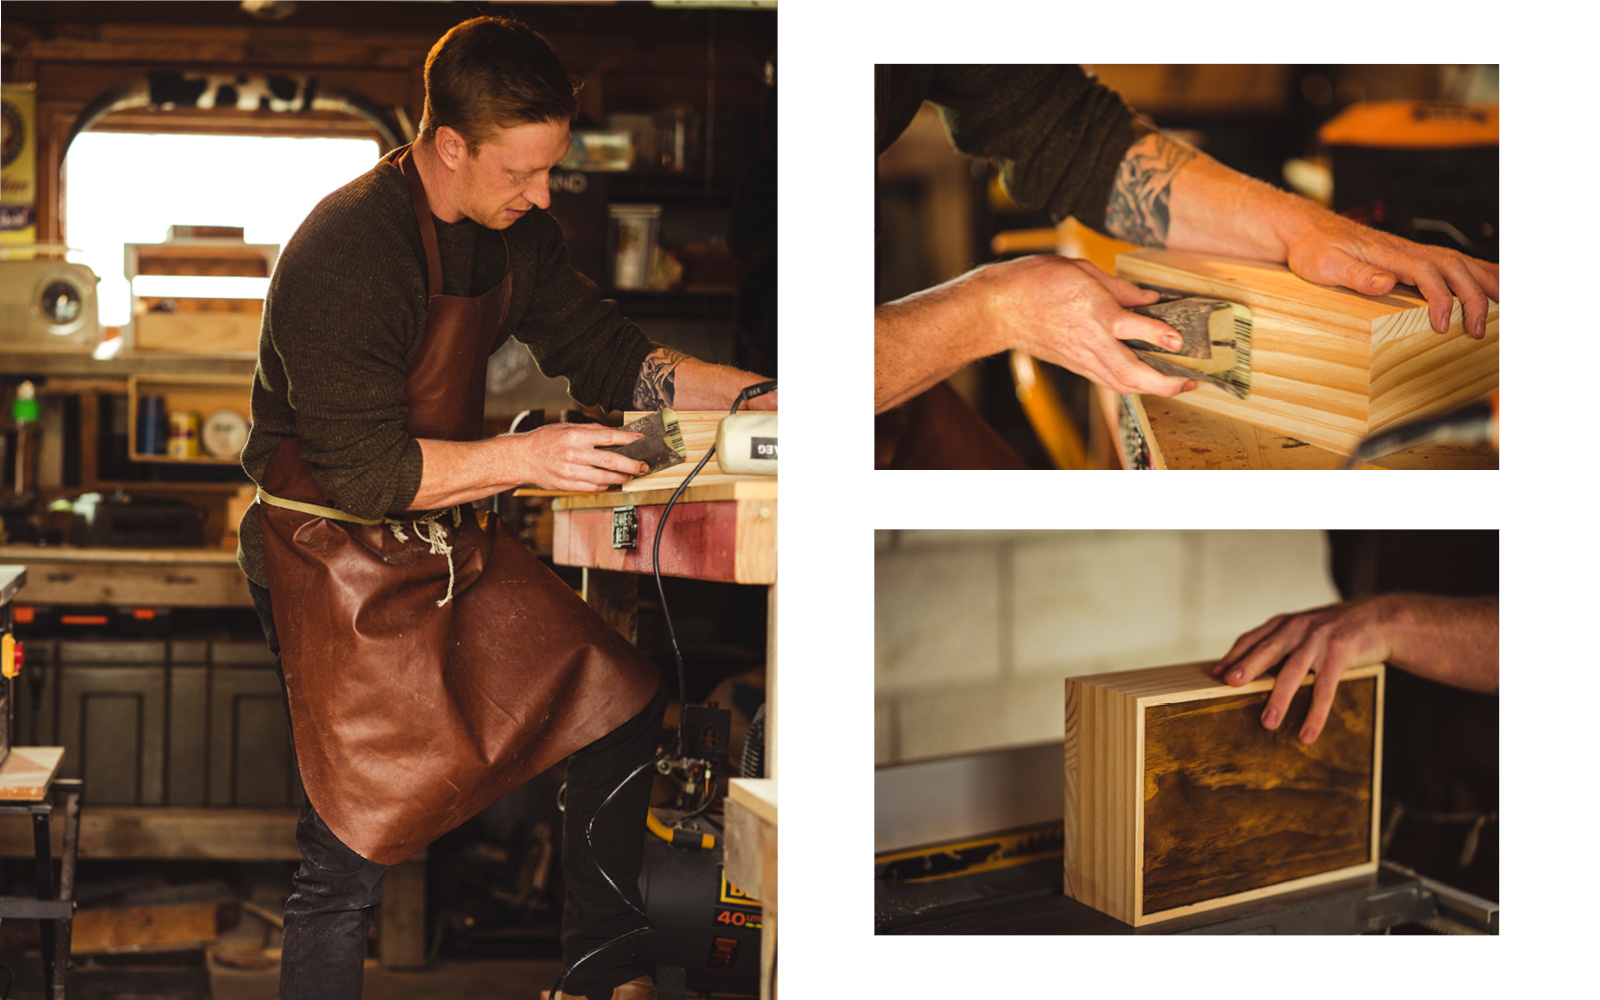 Lumberhand